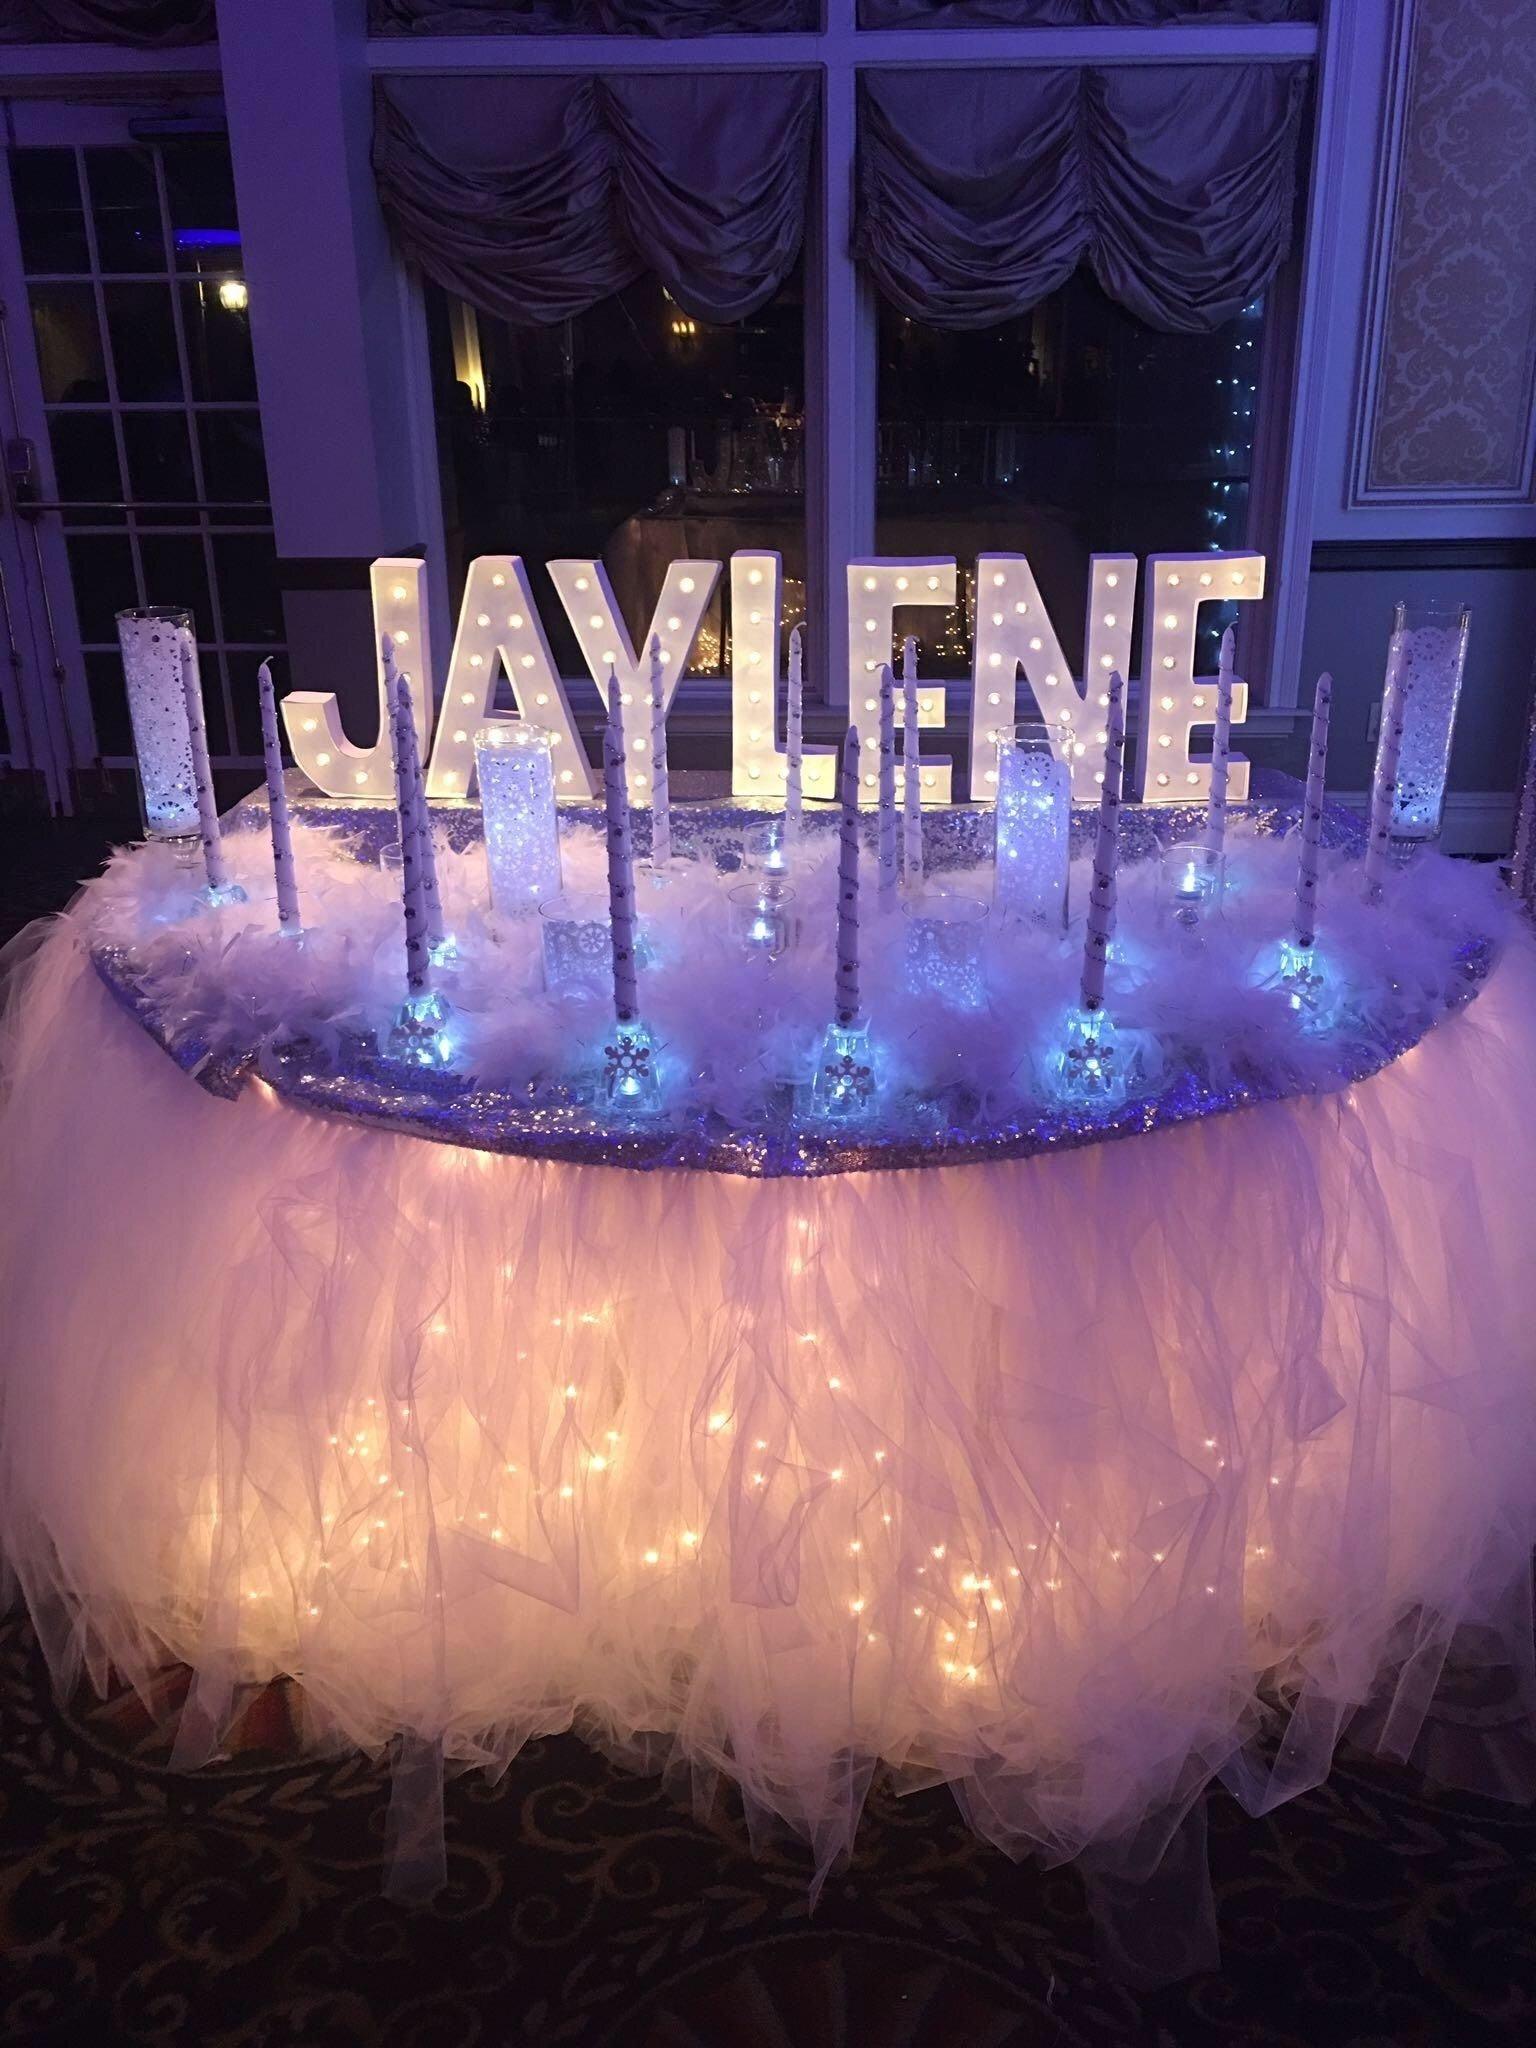 10 Fantastic Sweet 16 Ideas For Girls candle ceremony set up winter wonderland sweet 16 winter 8 2021